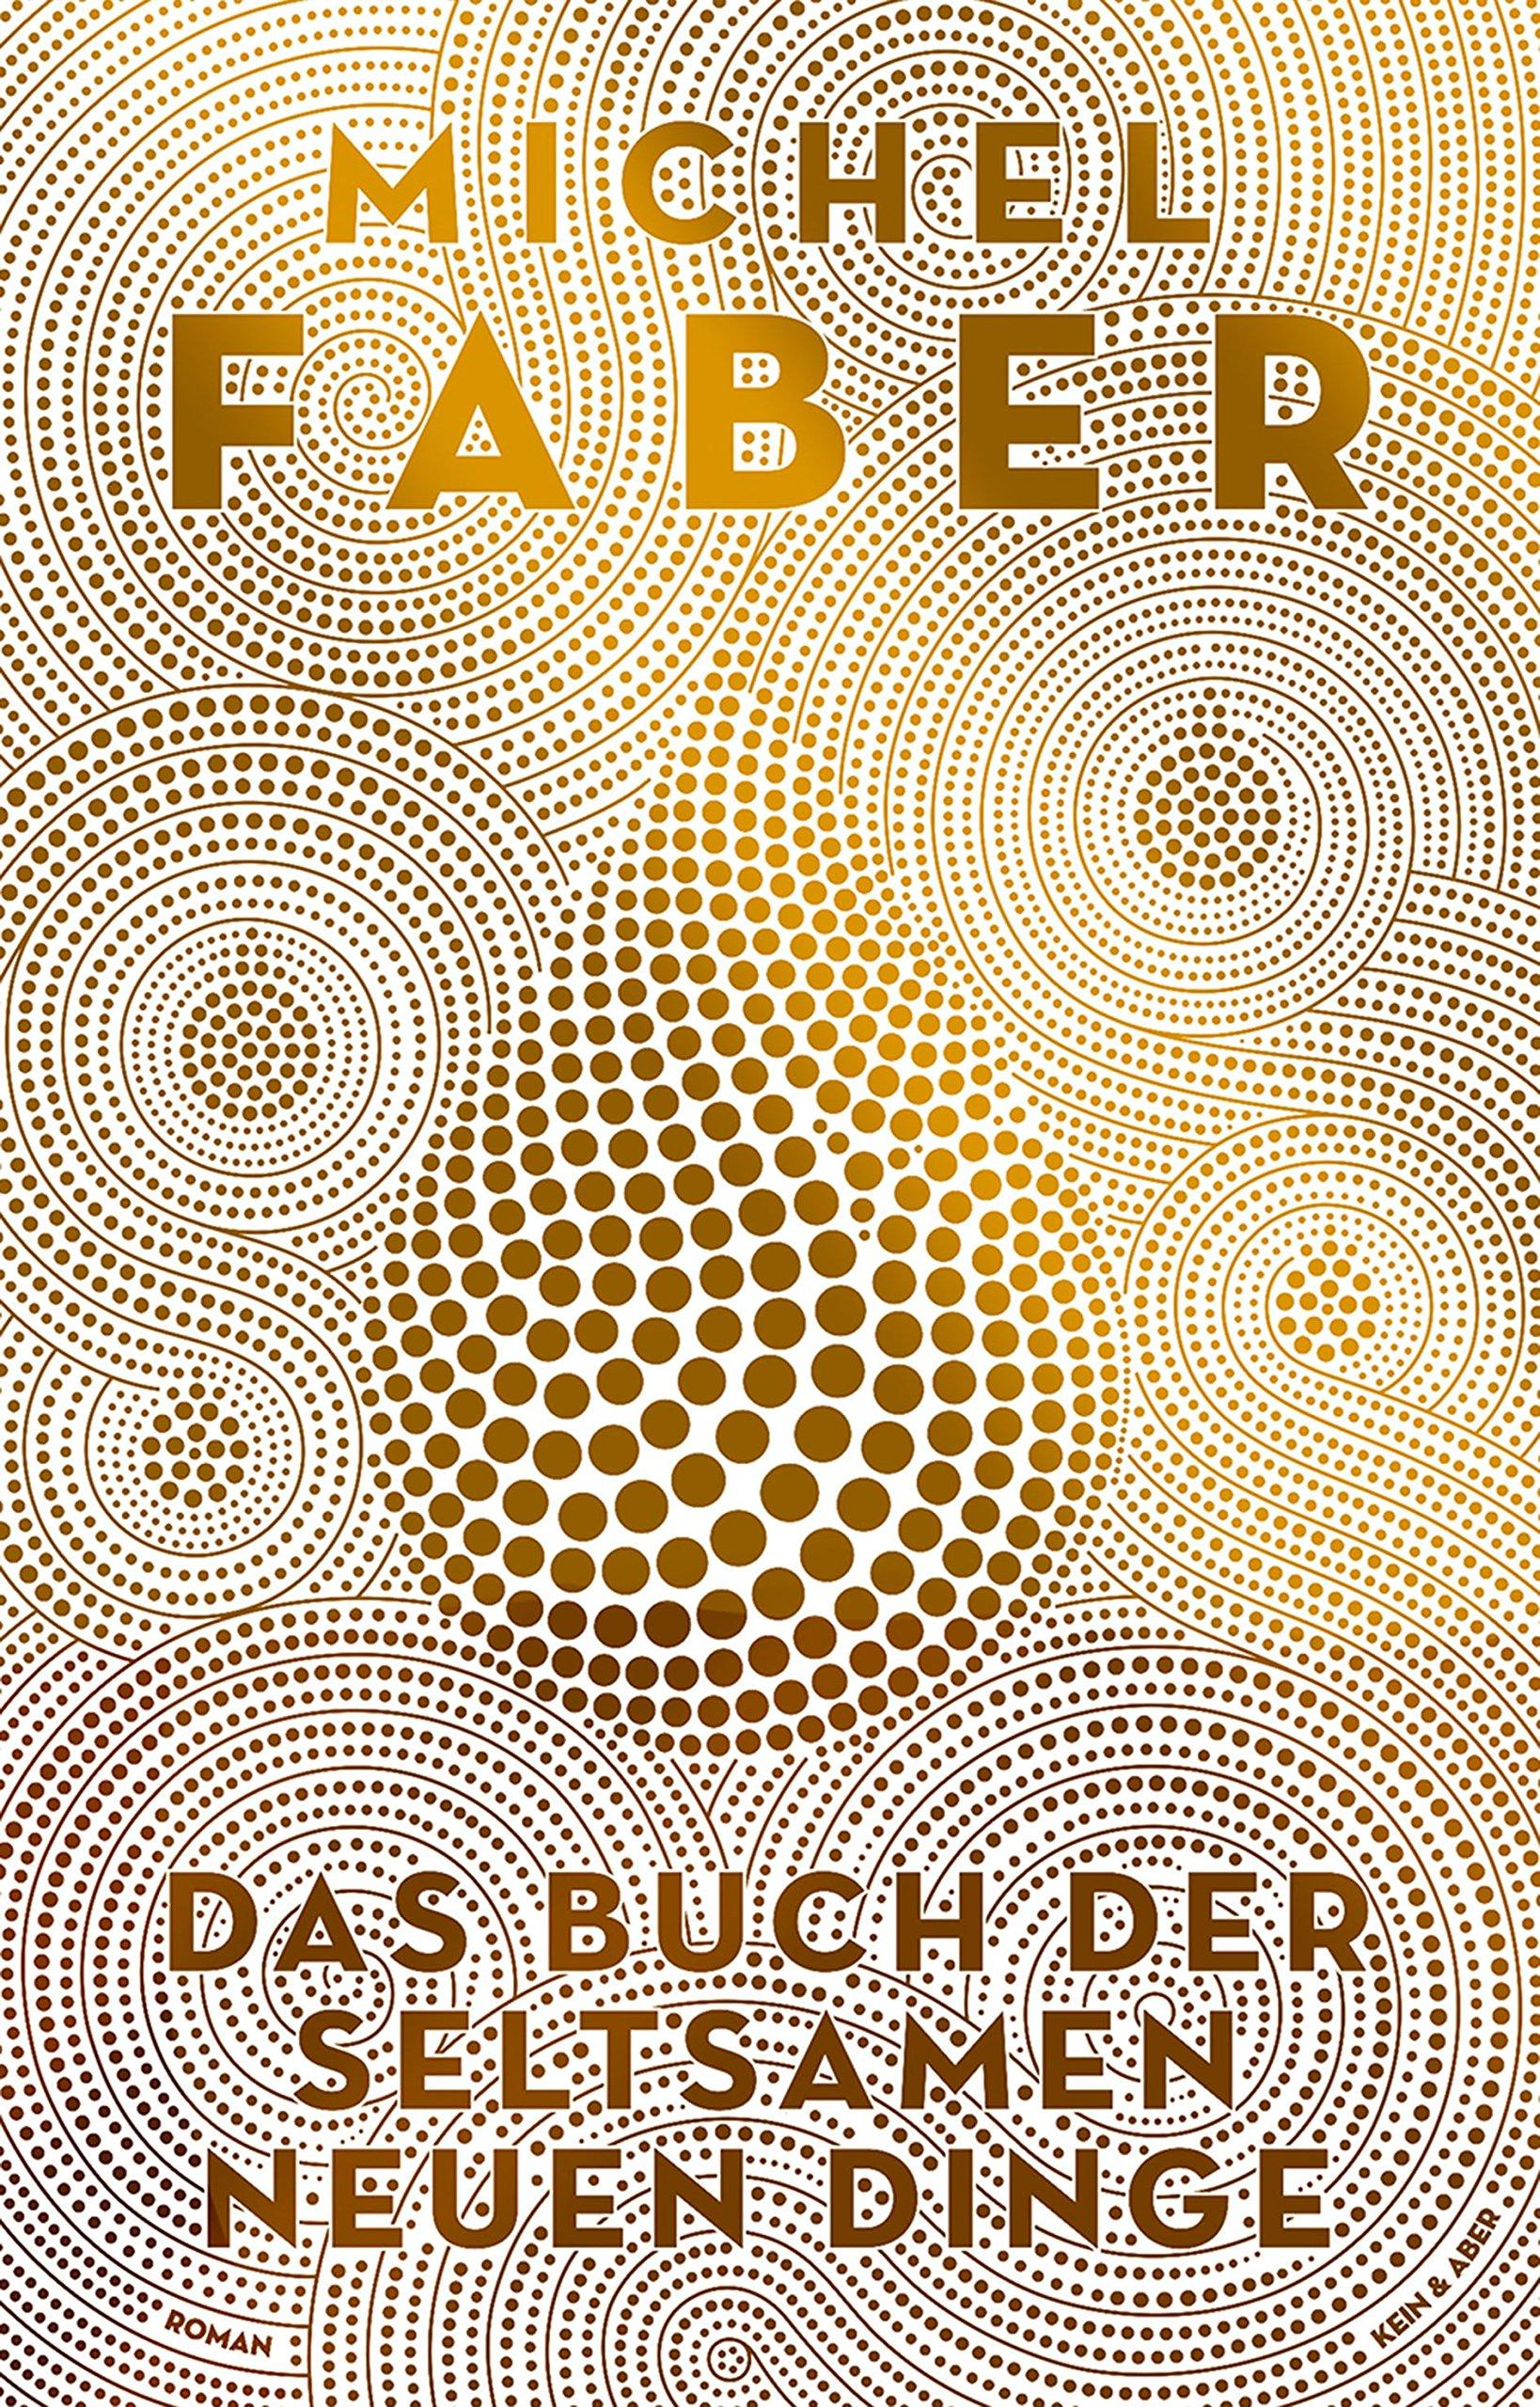 Das Buch der seltsamen neuen Dinge: Amazon.de: Michel Faber: Bücher